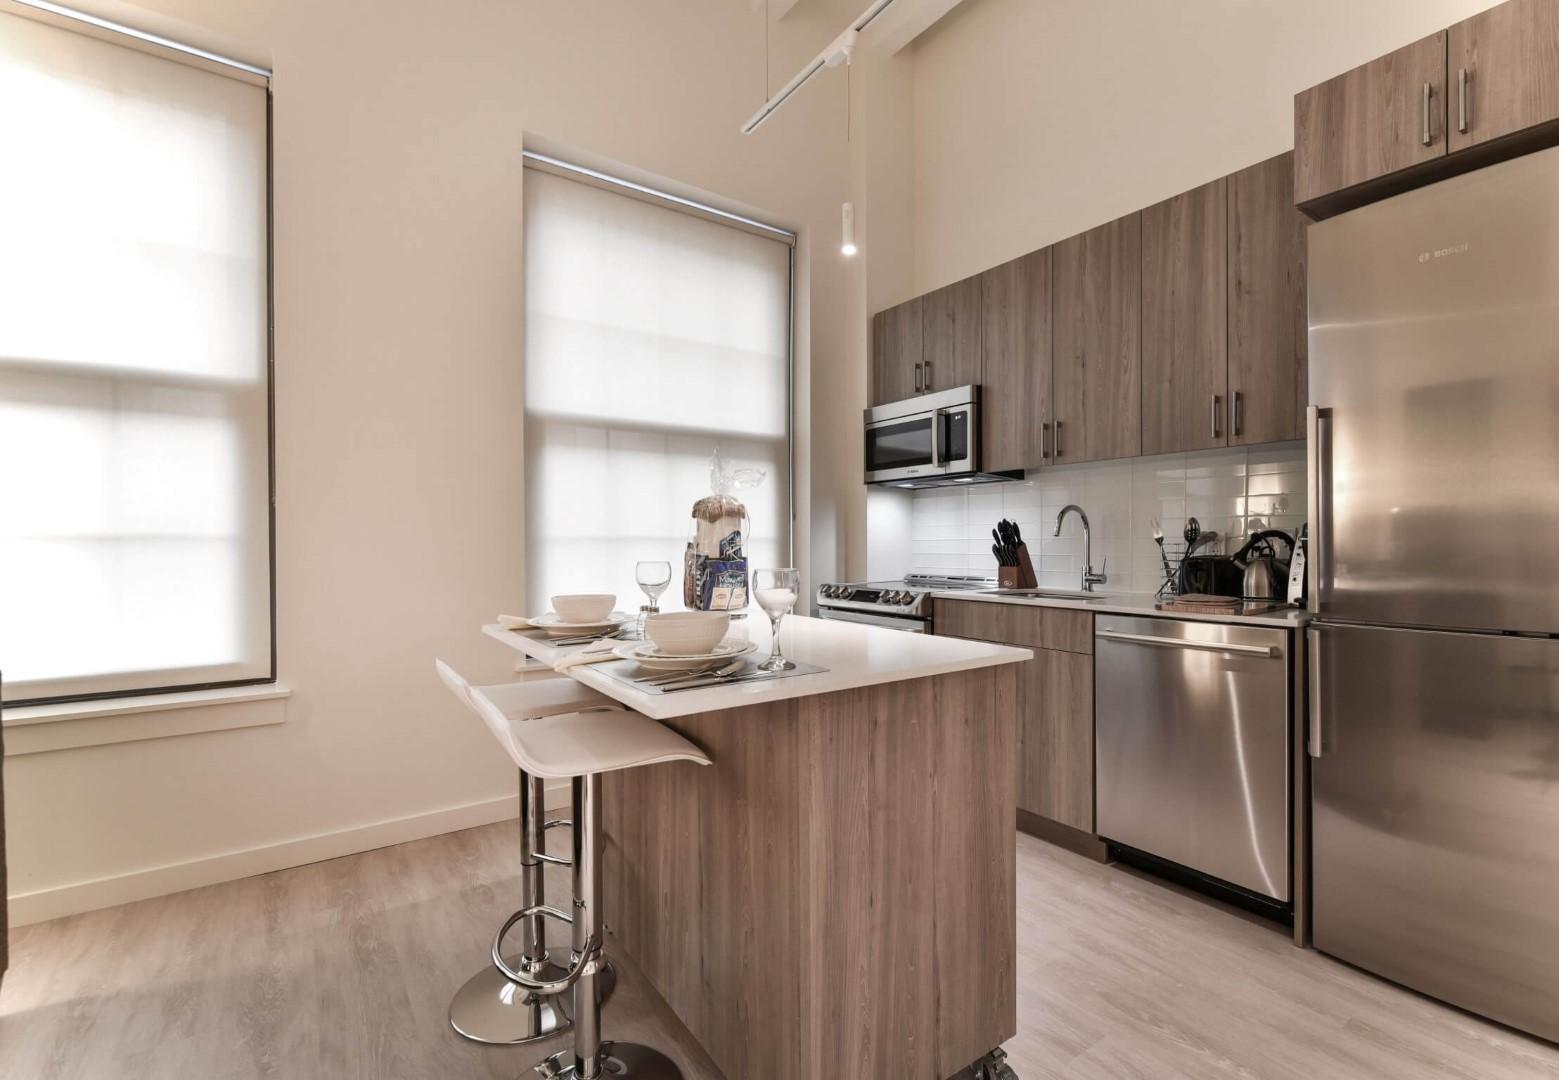 Kitchen at 8 Harrison Apartments, Centre, Boston